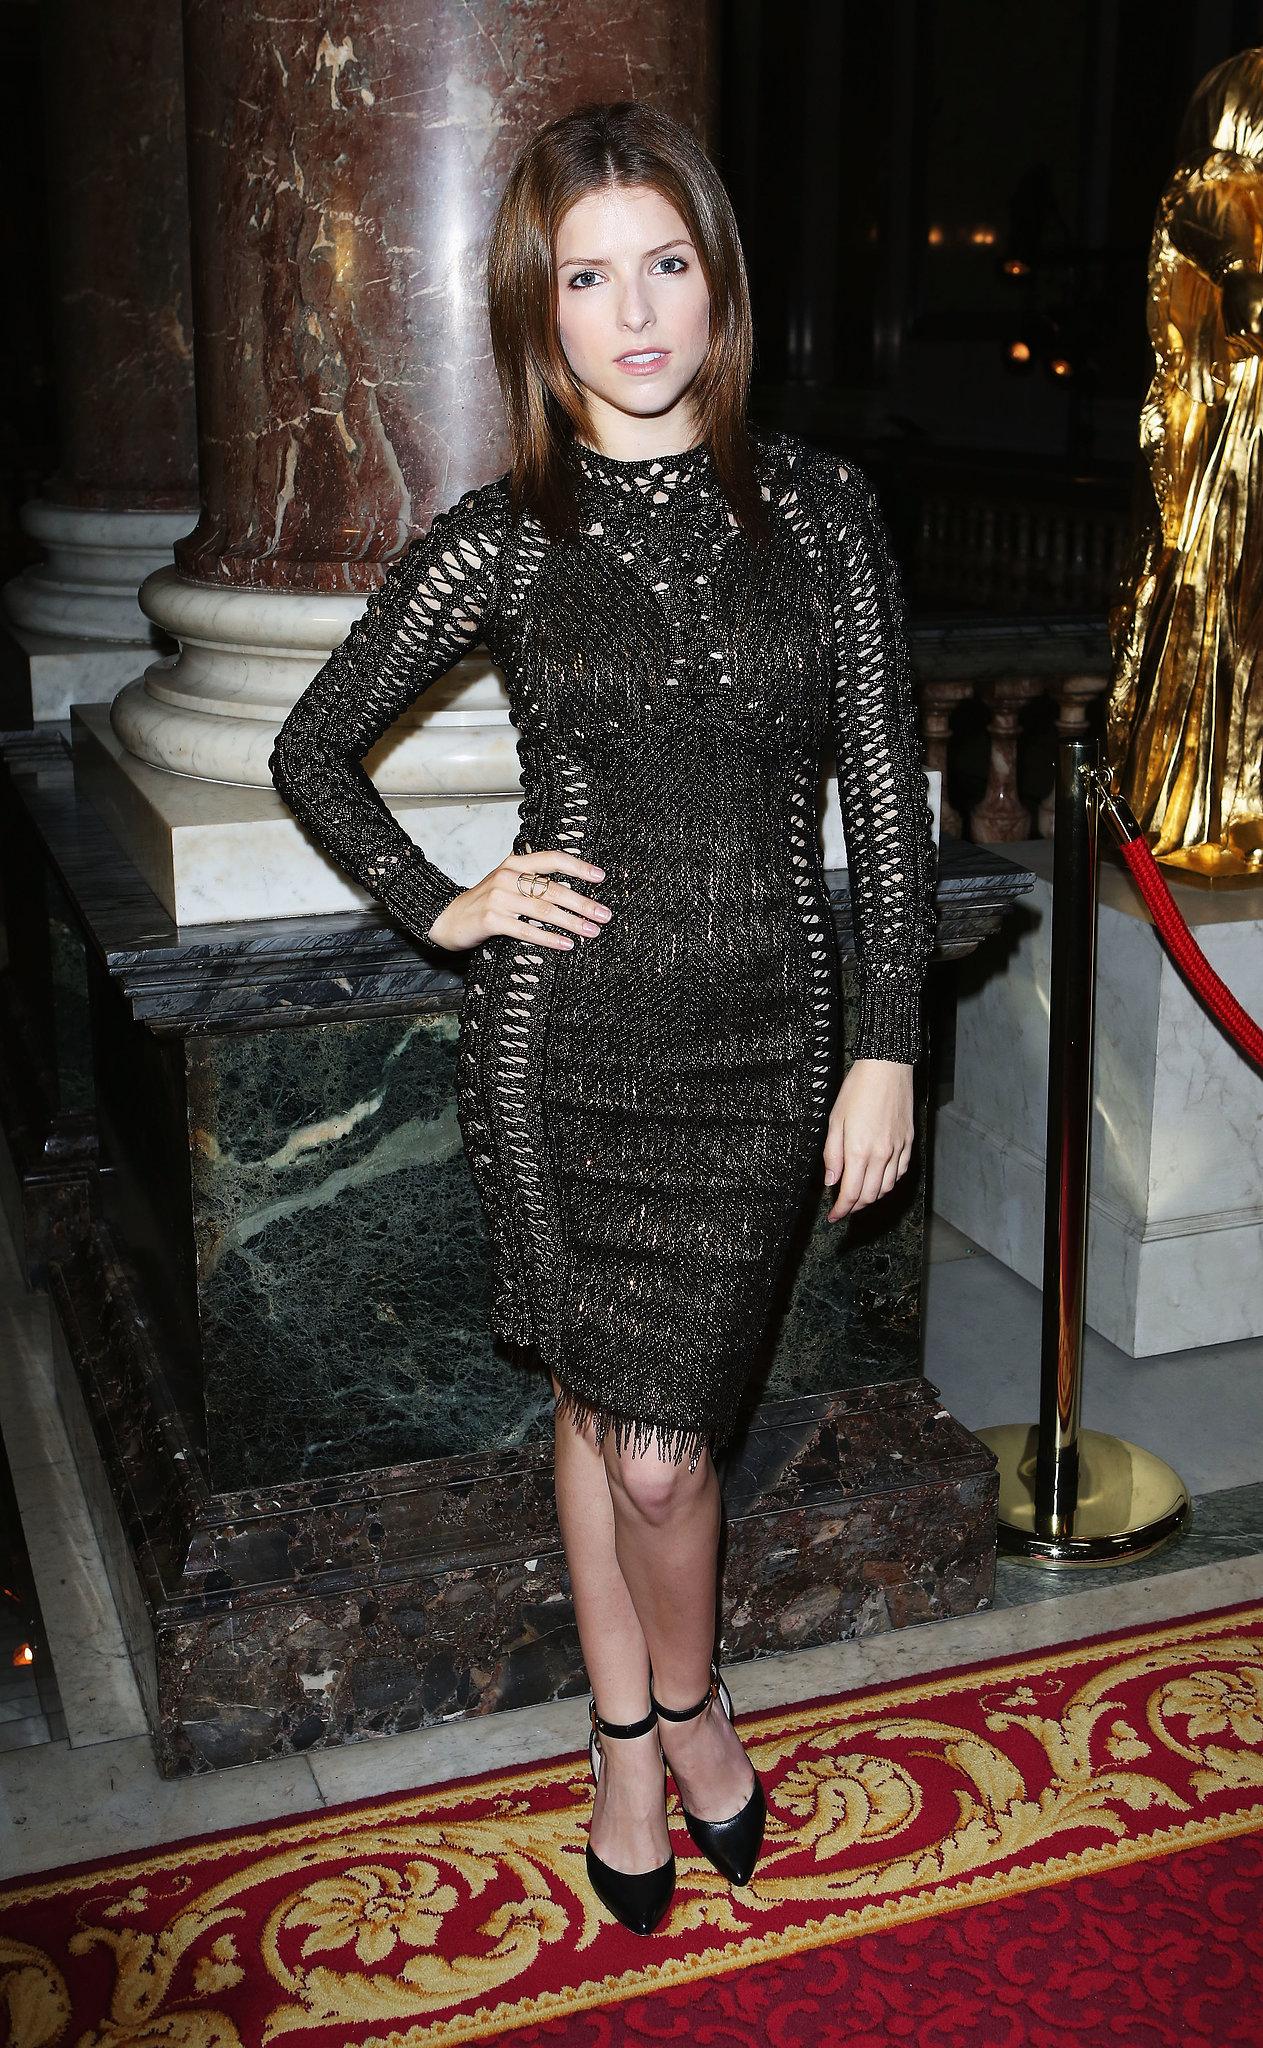 Anna Kendrick took in the Julien Macdonald show at London Fashion Week.